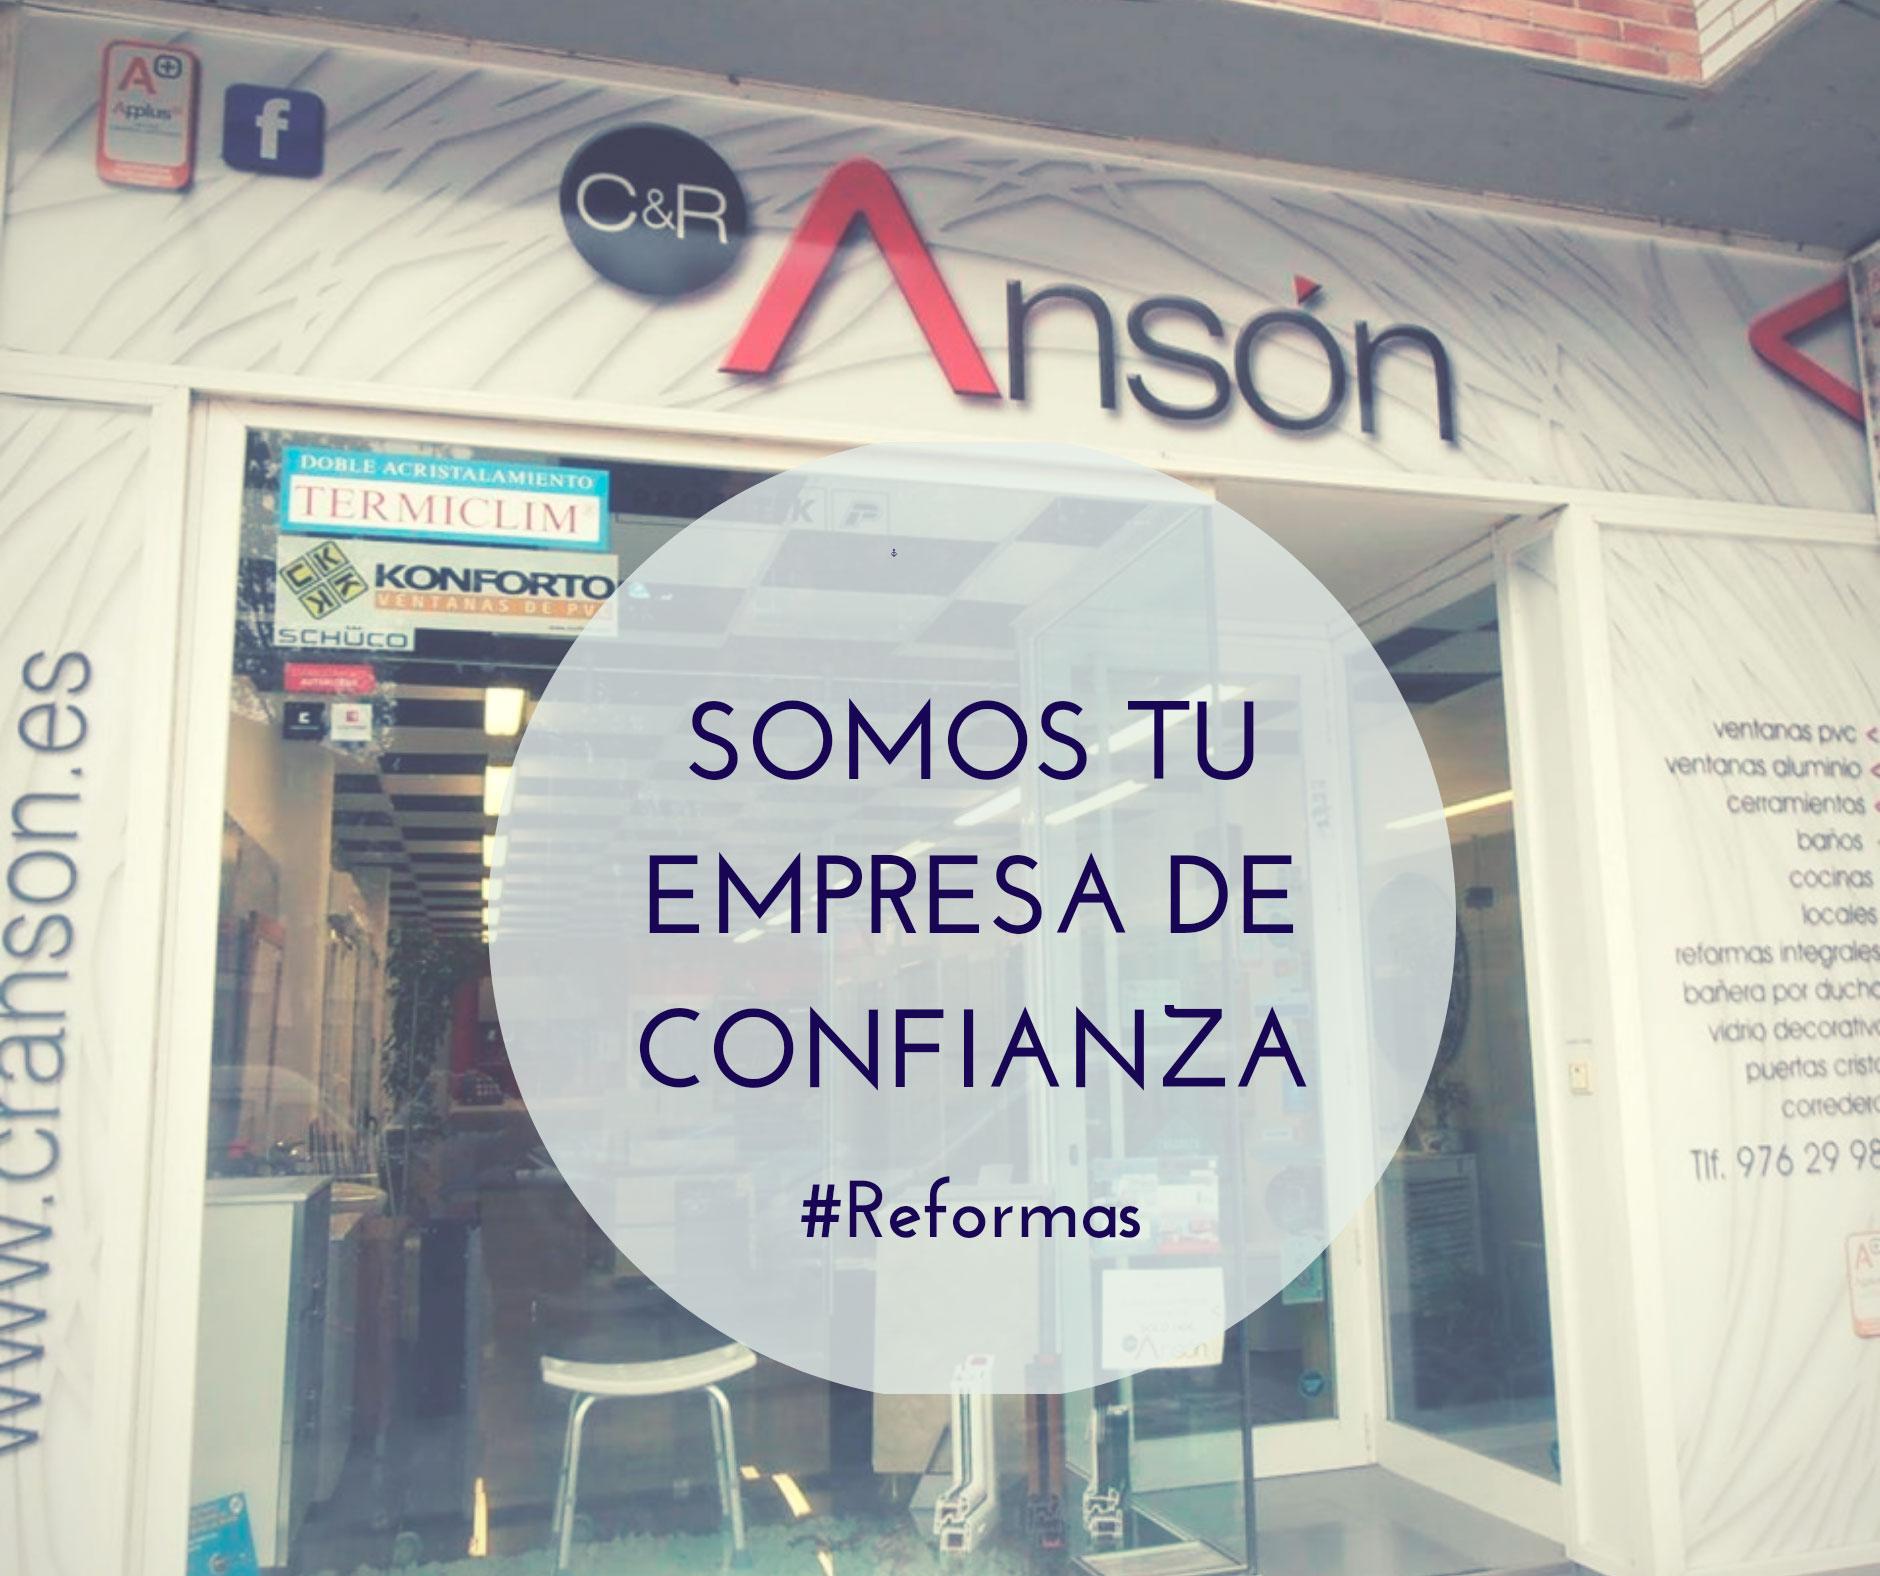 anson(1)